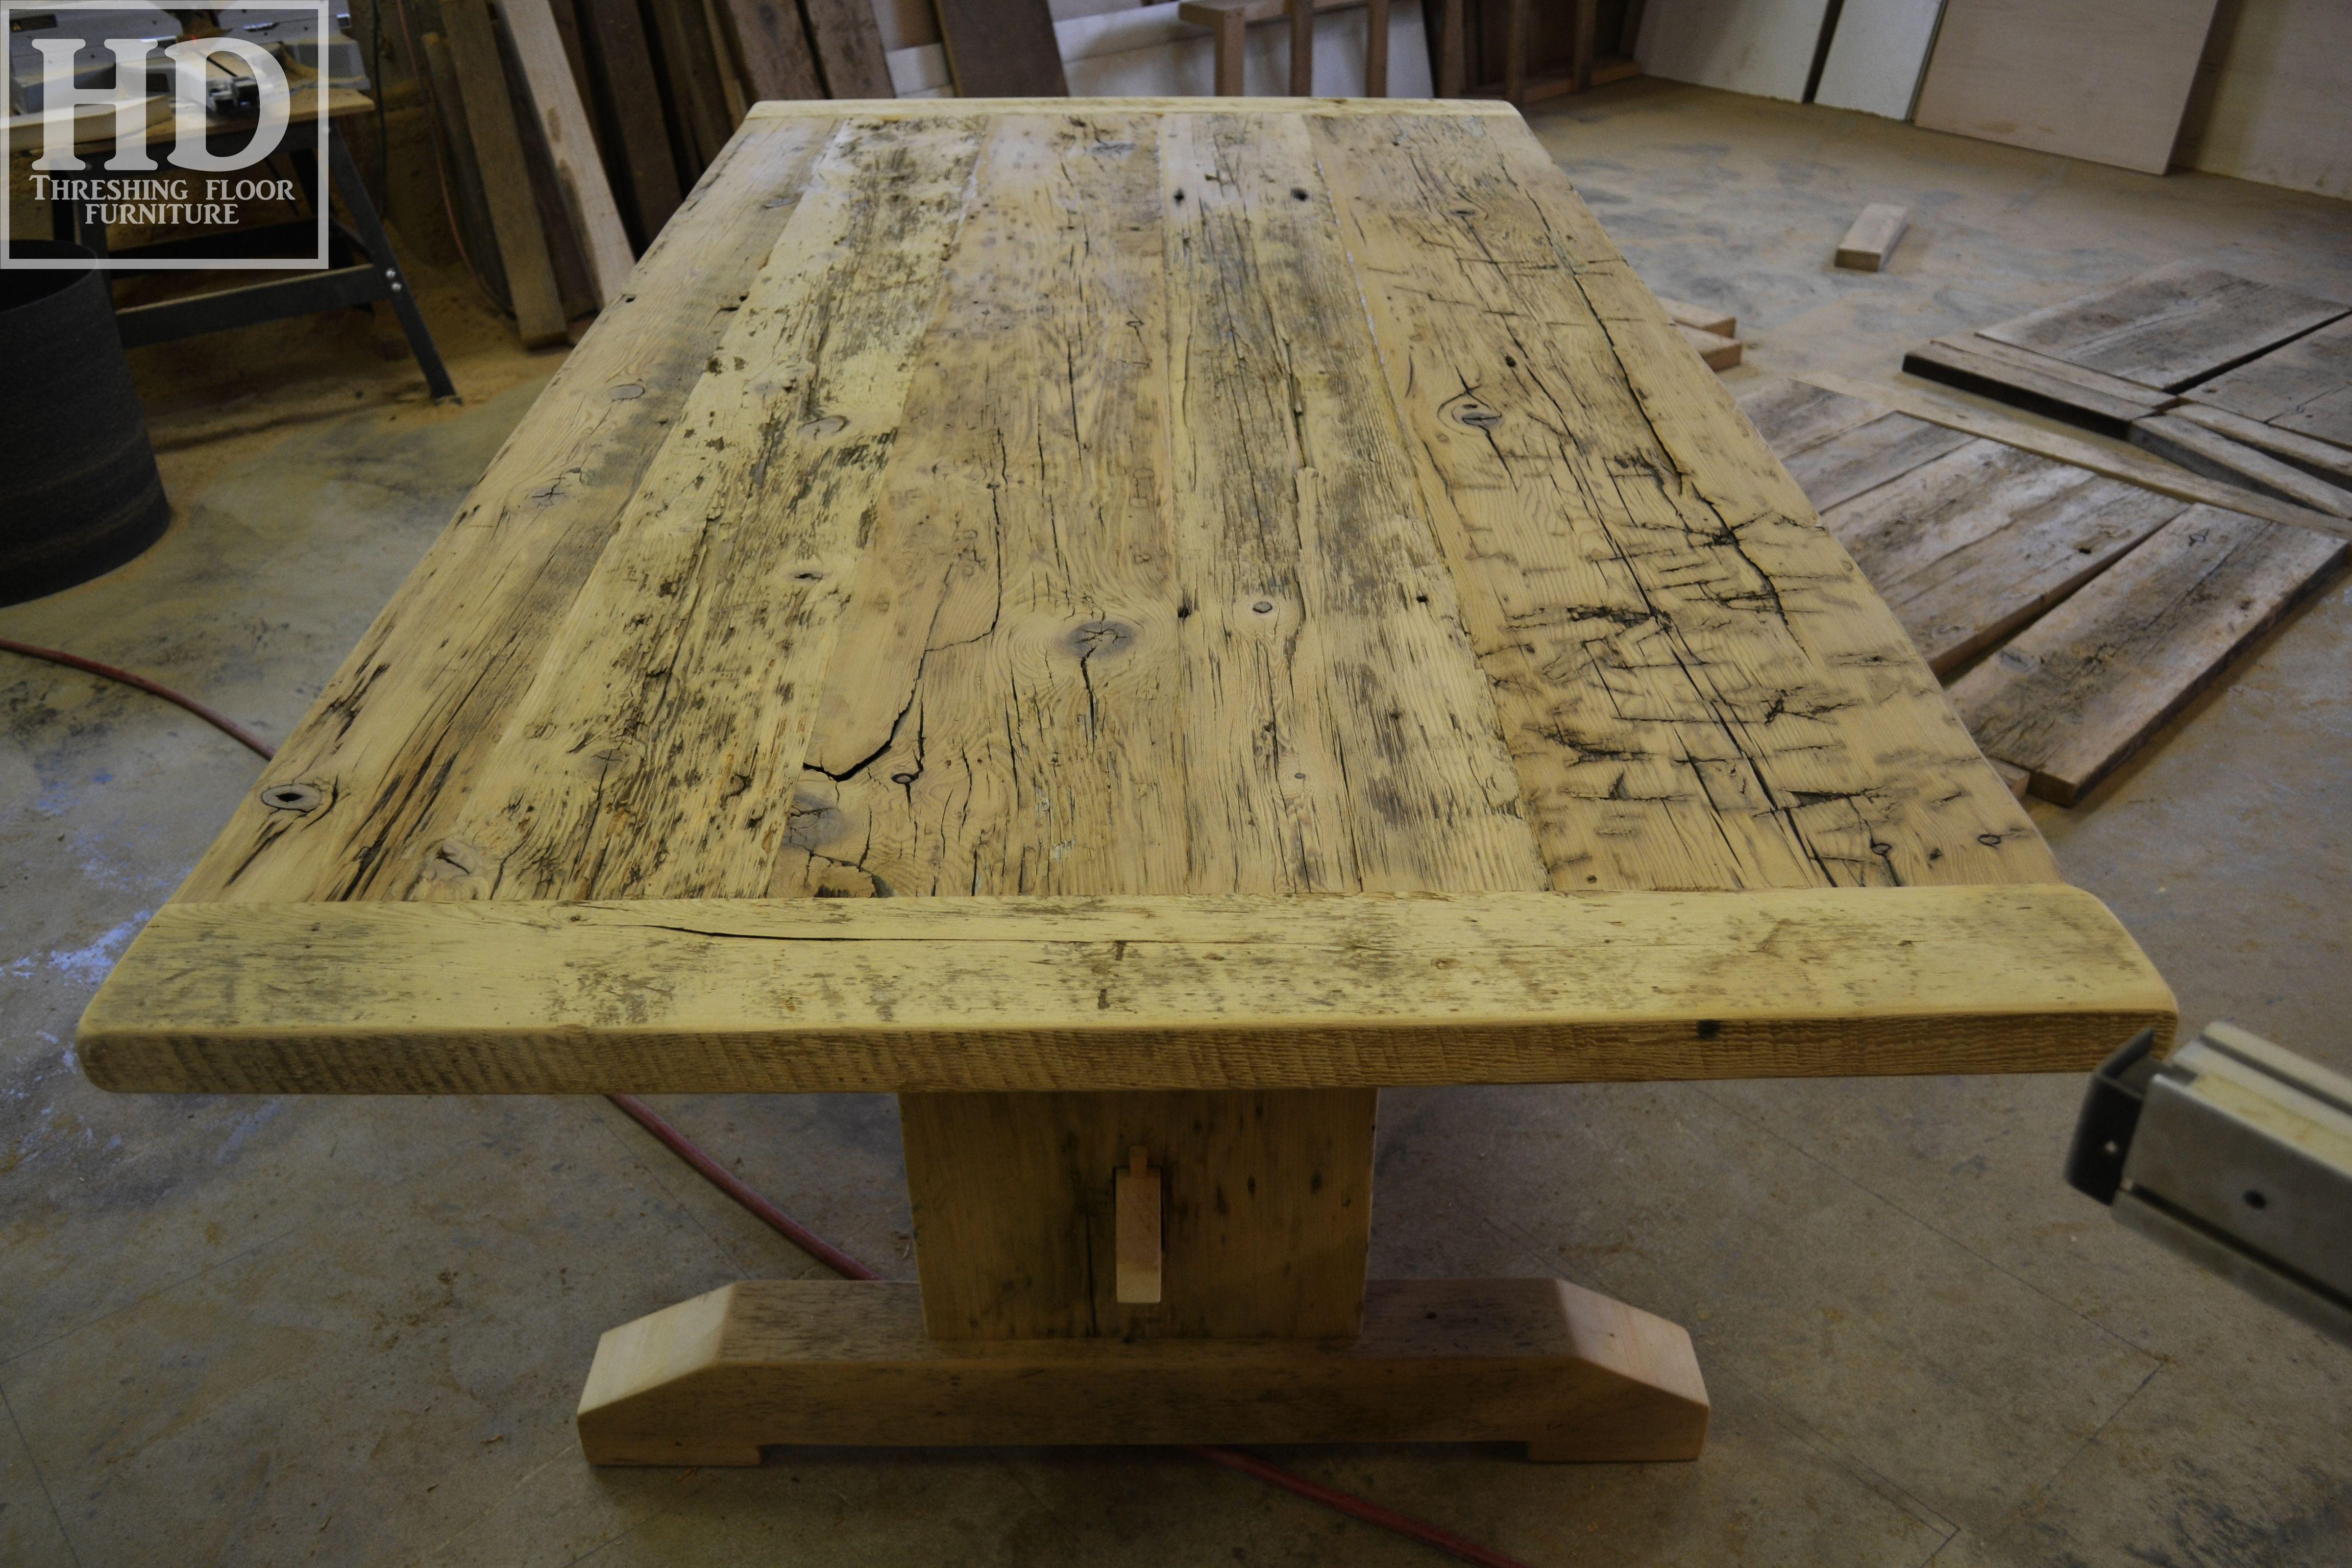 Ontario Reclaimed Wood Furniture Custom Built By Hd Threshing